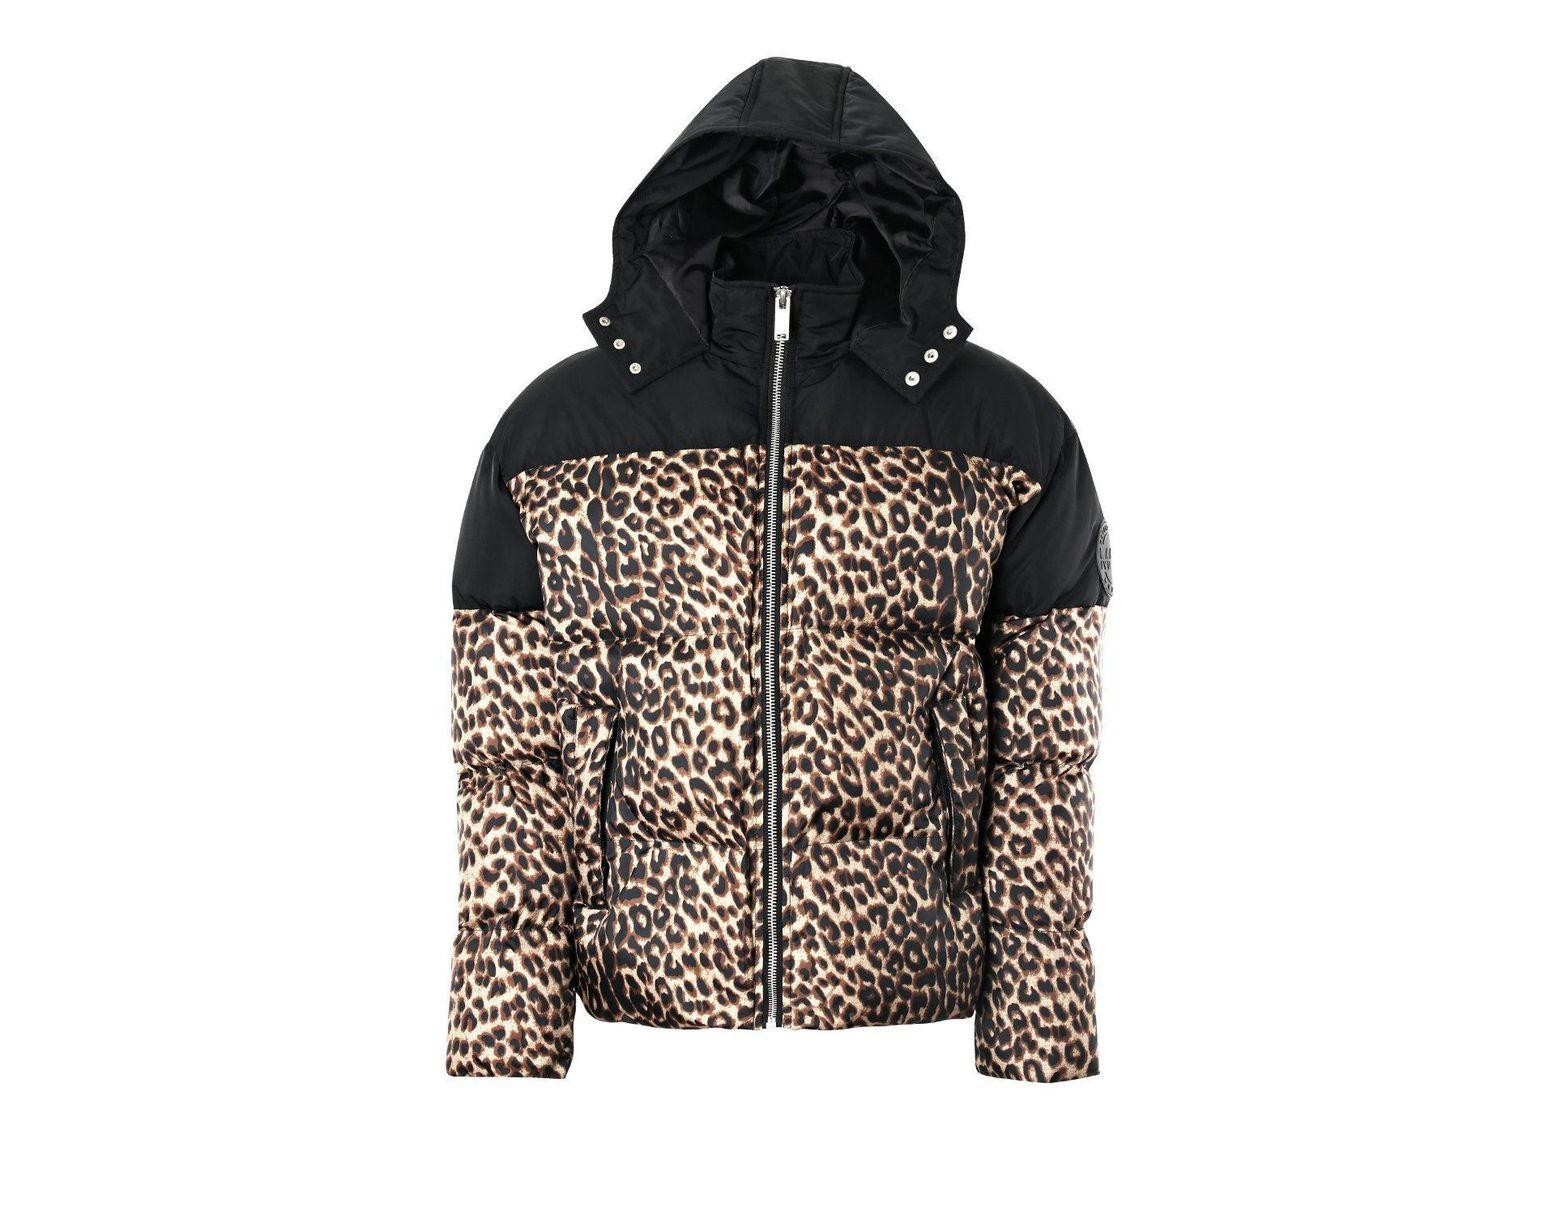 750aae3cf7e0 Boohoo Leopard Print Contrast Puffer in Black for Men - Lyst